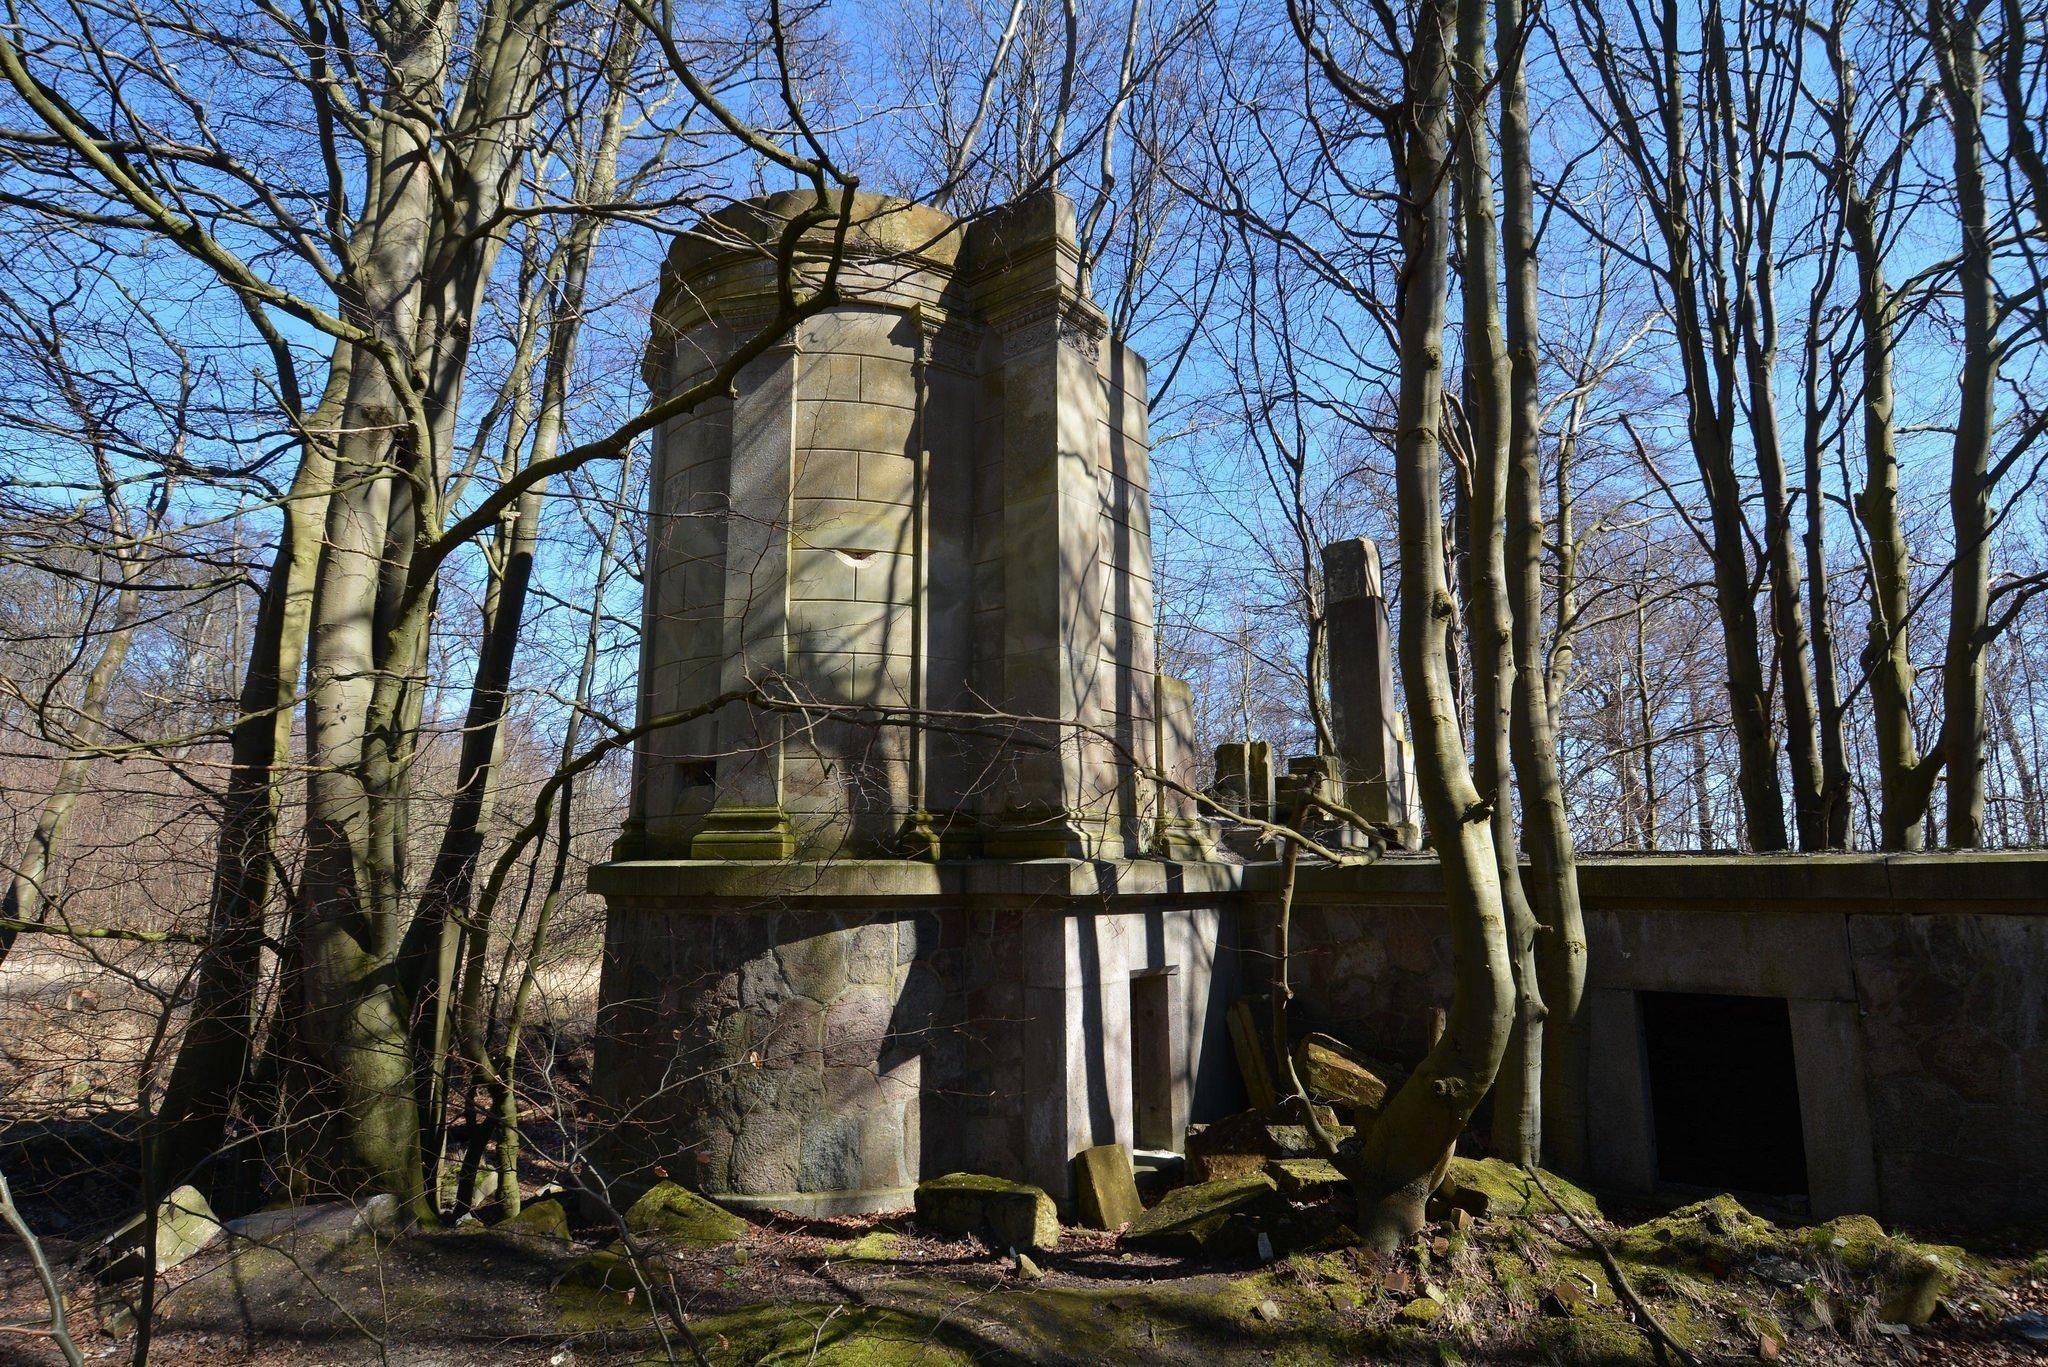 verlassene burg ruinen abandoned castle urbex lost places germany deutschland